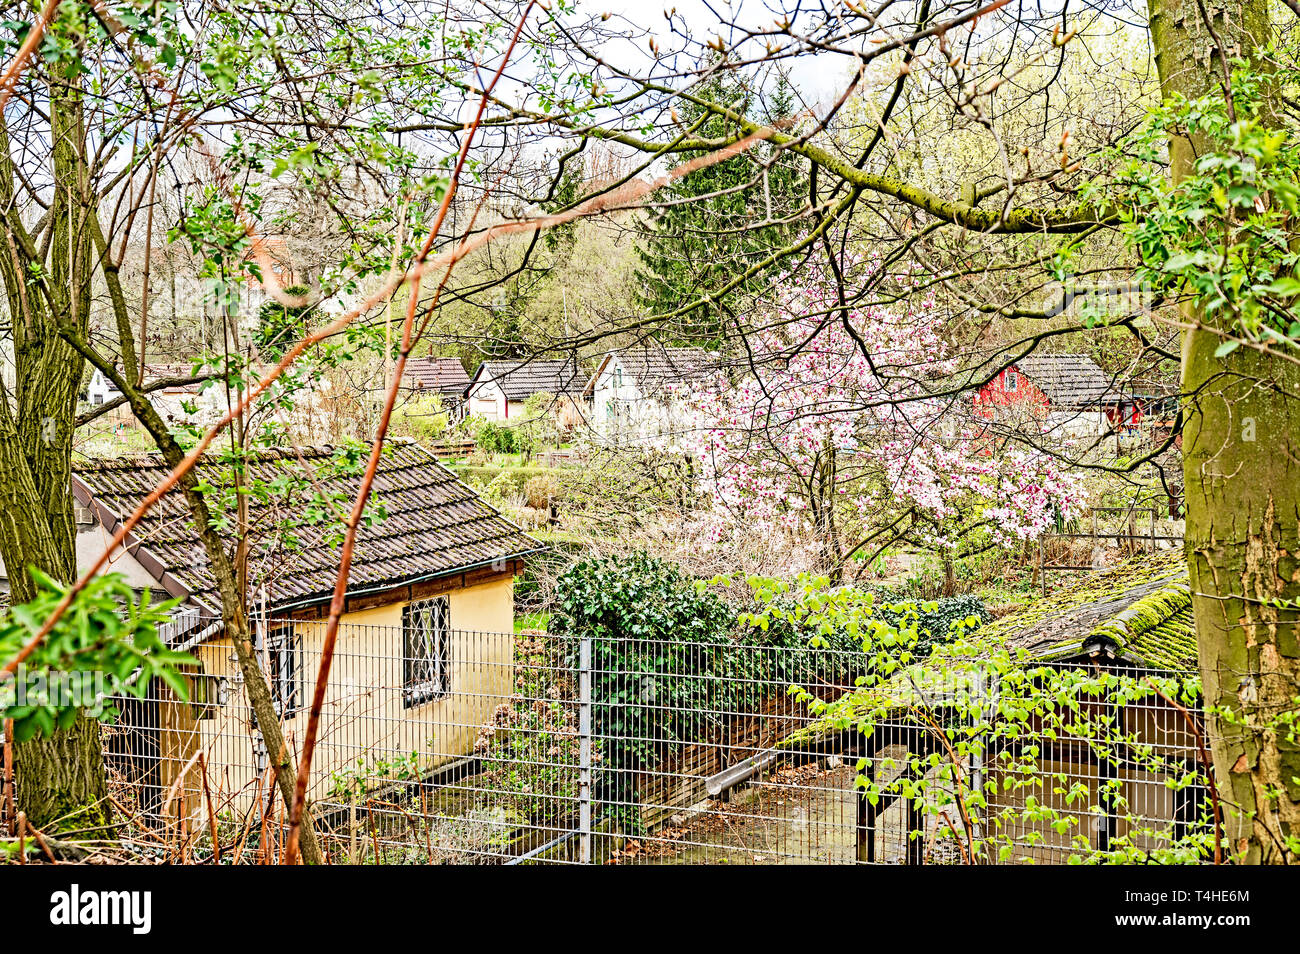 Allotment garden in Bochum (Germany); Schrebergarten in Bochum - Stock Image